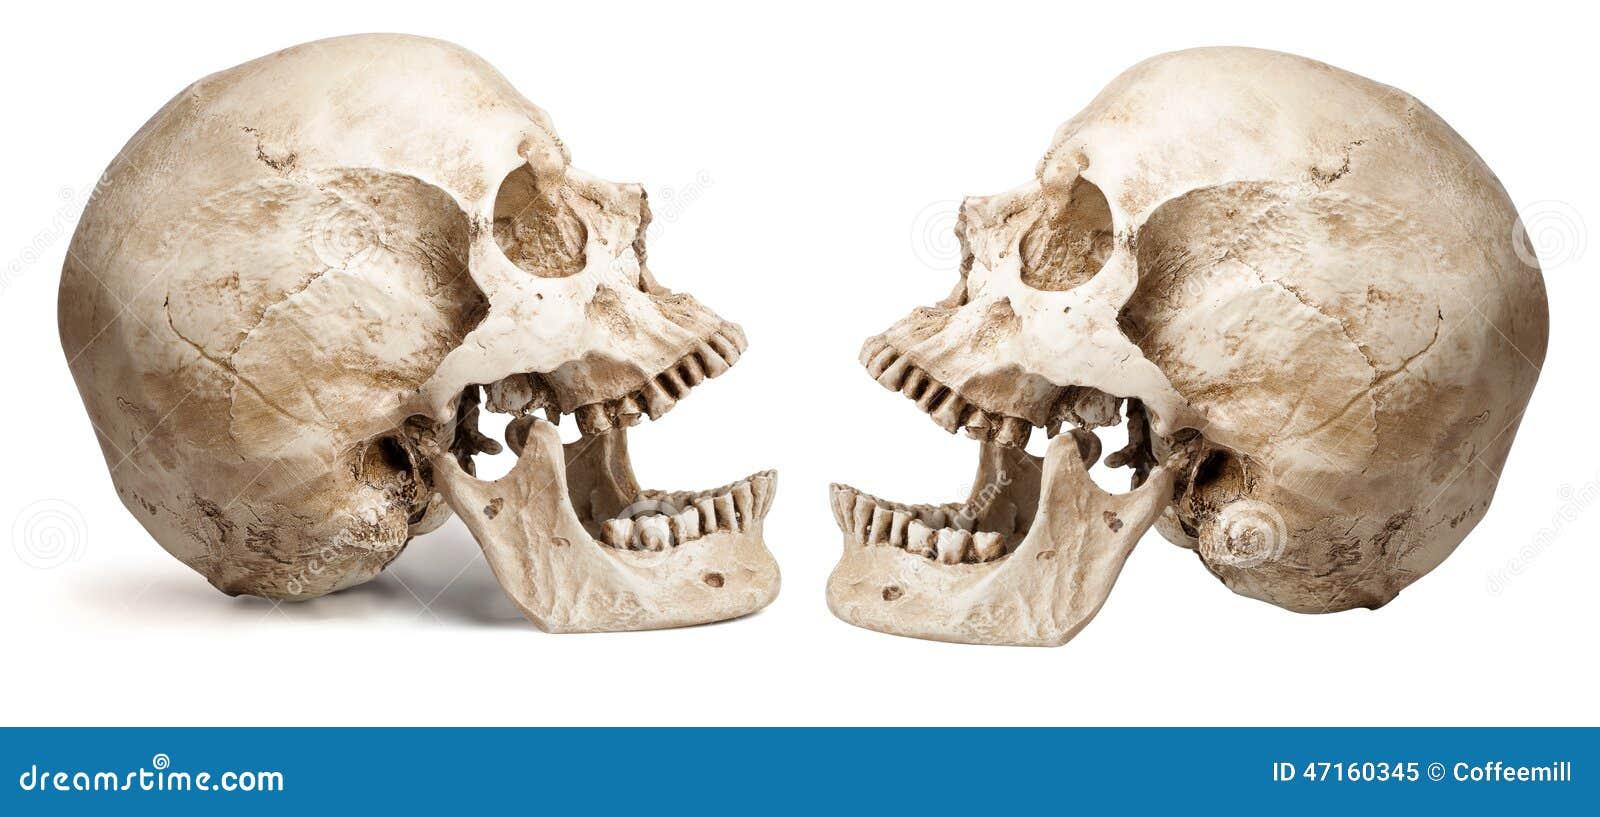 Charmant Rückseite Mund Anatomie Ideen - Anatomie Ideen - finotti.info